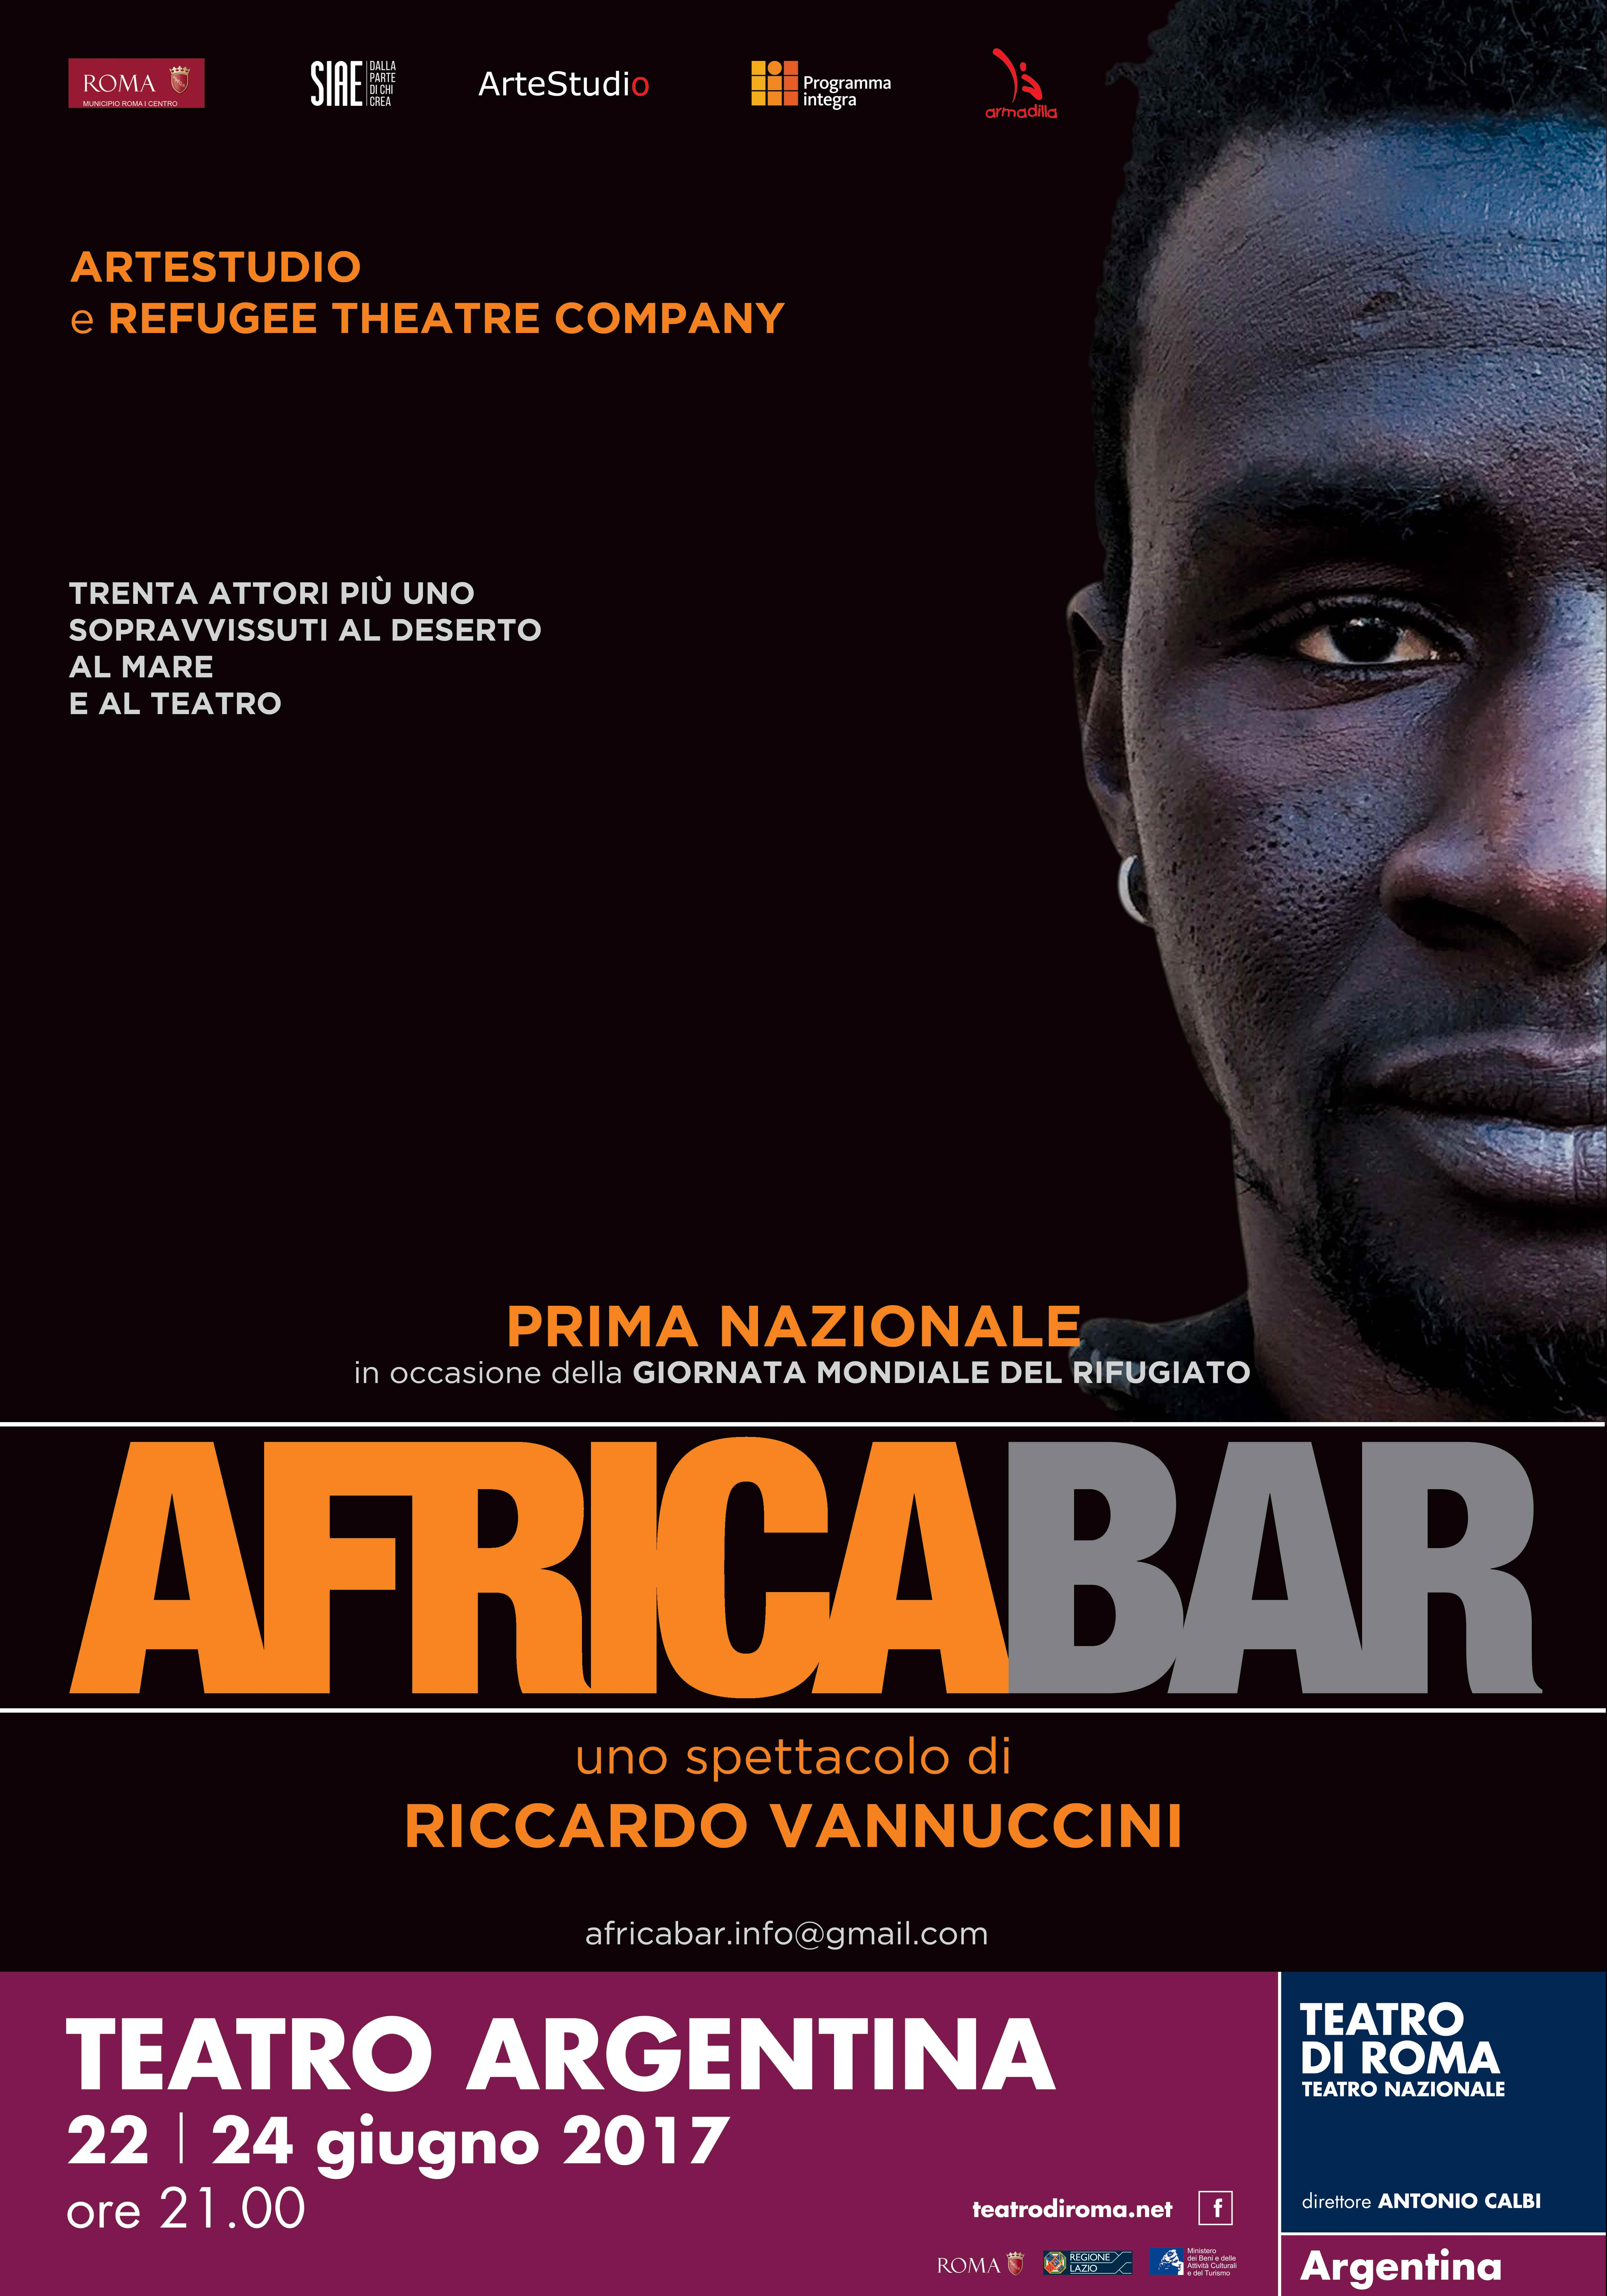 70x100-africabar-8 manifesto